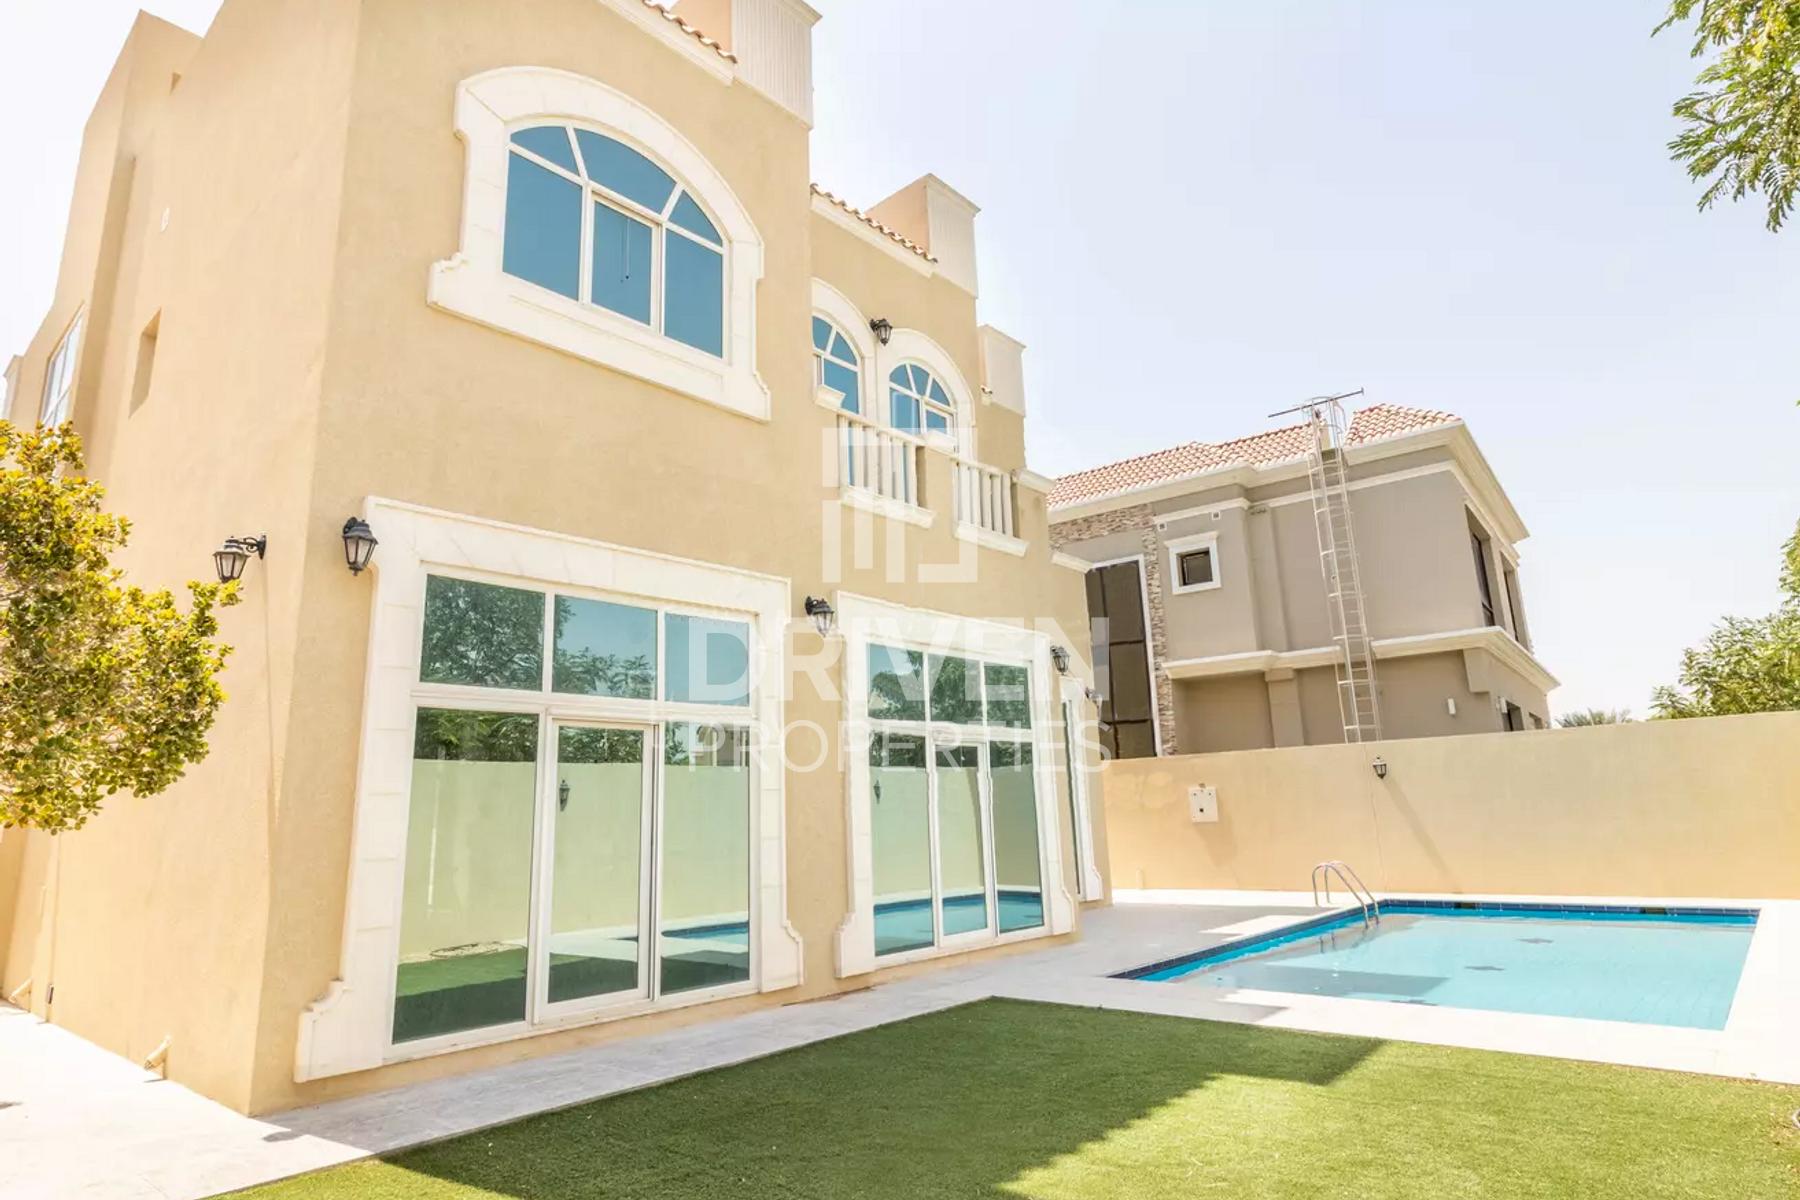 5 Bed Custom Build Villa, Pool Backing Park